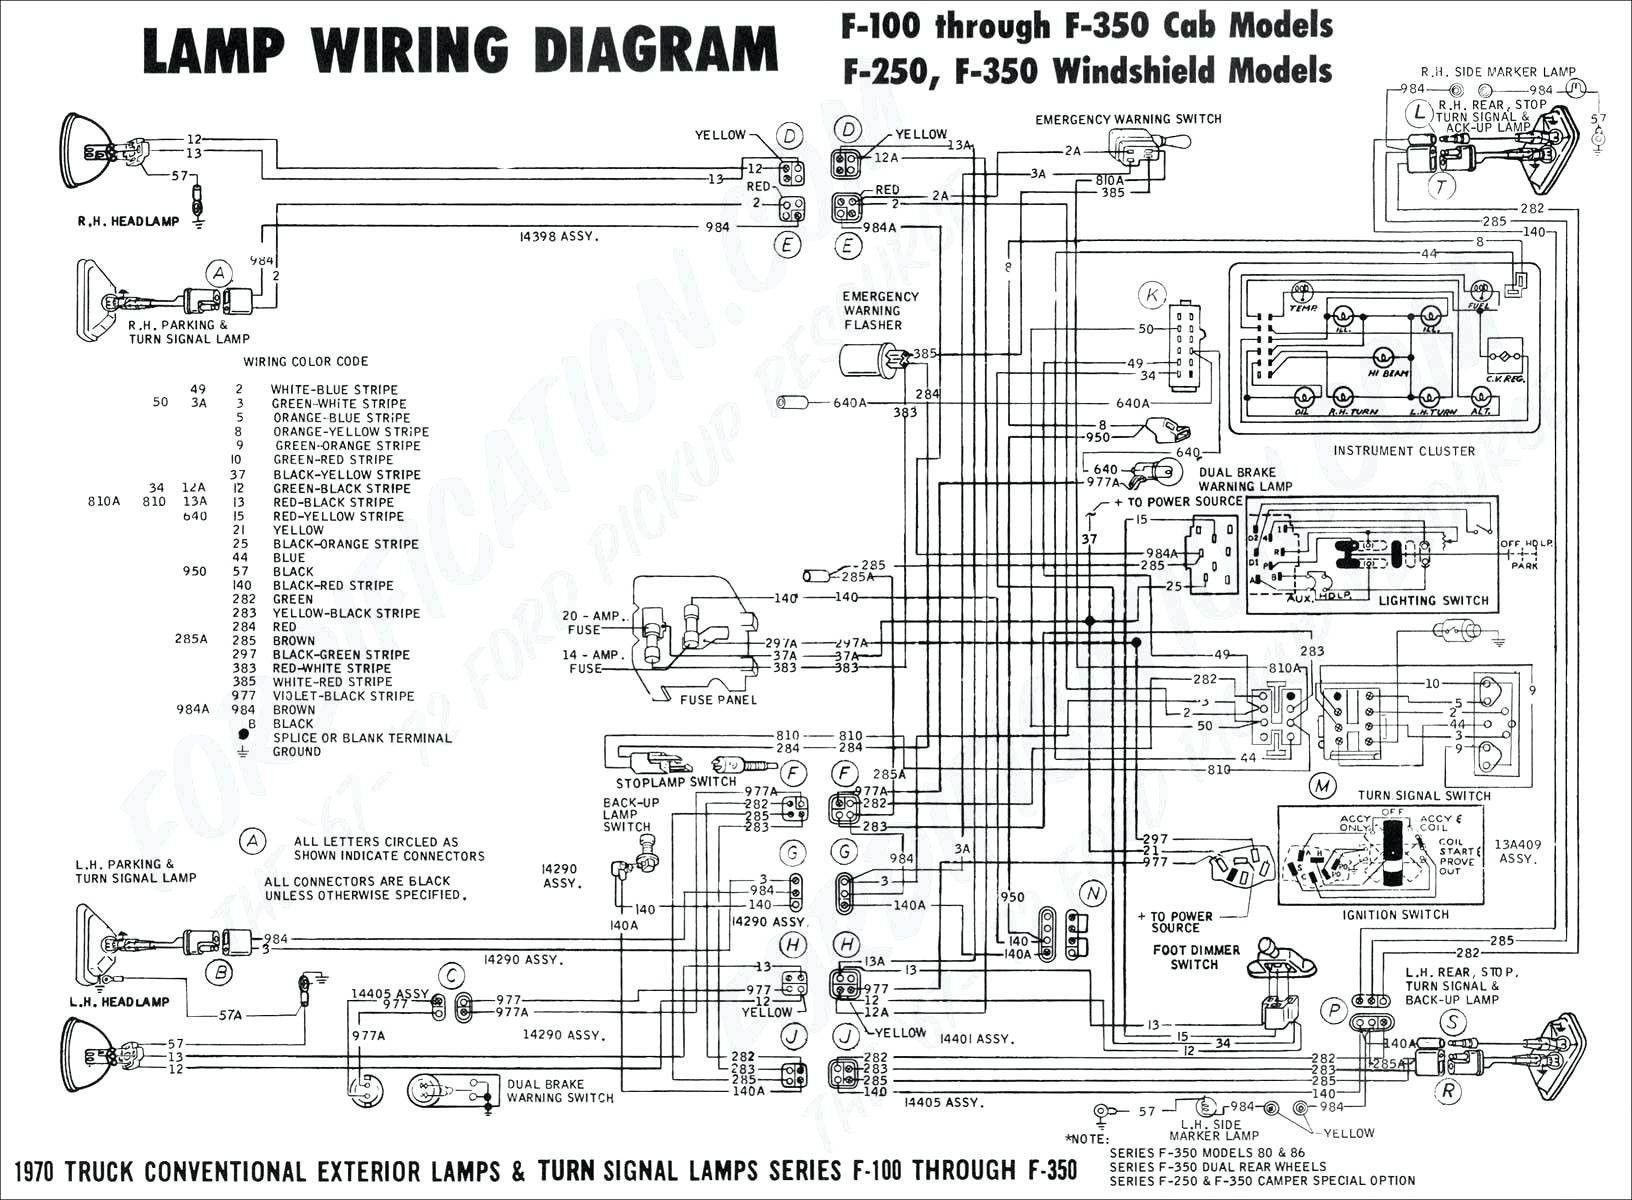 1969 ford 3 Wire Alternator Diagram Lovely Wiring Diagram Vespa Excel 150 Diagrams Of 1969 ford 3 Wire Alternator Diagram